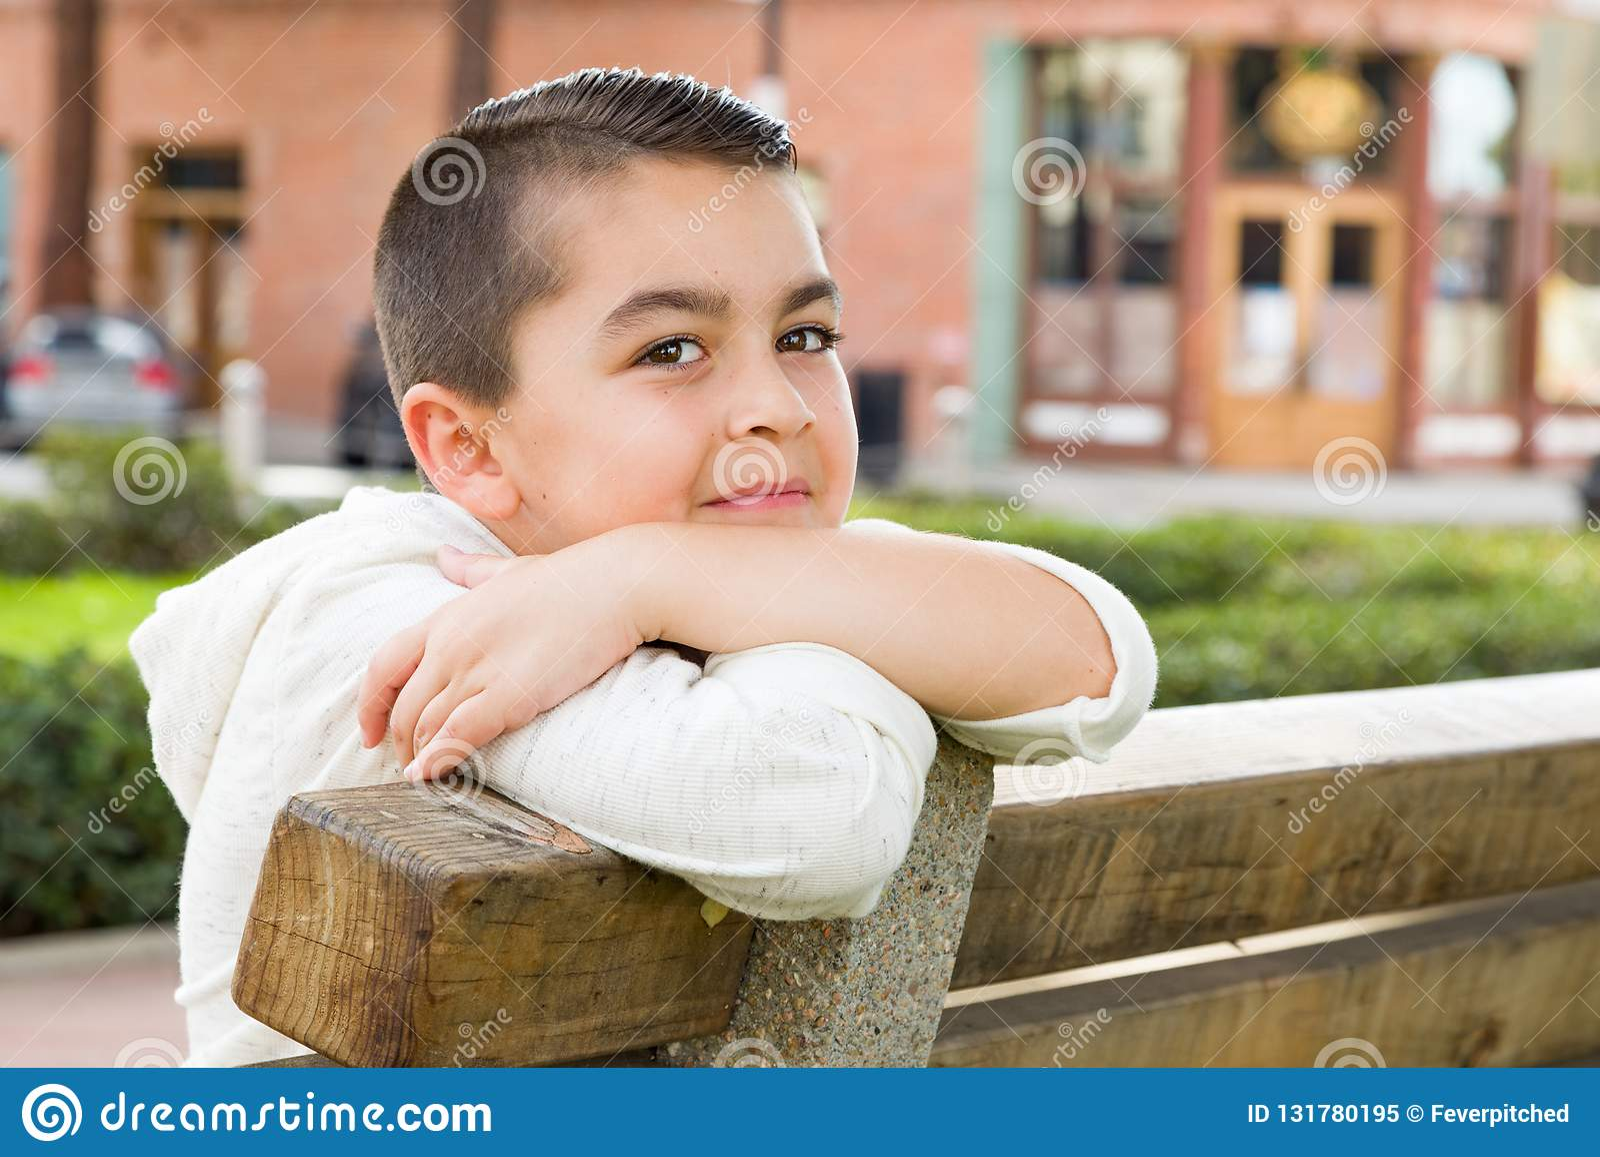 Mixed Race Young Hispanic Caucasian Boy on a Park Bench